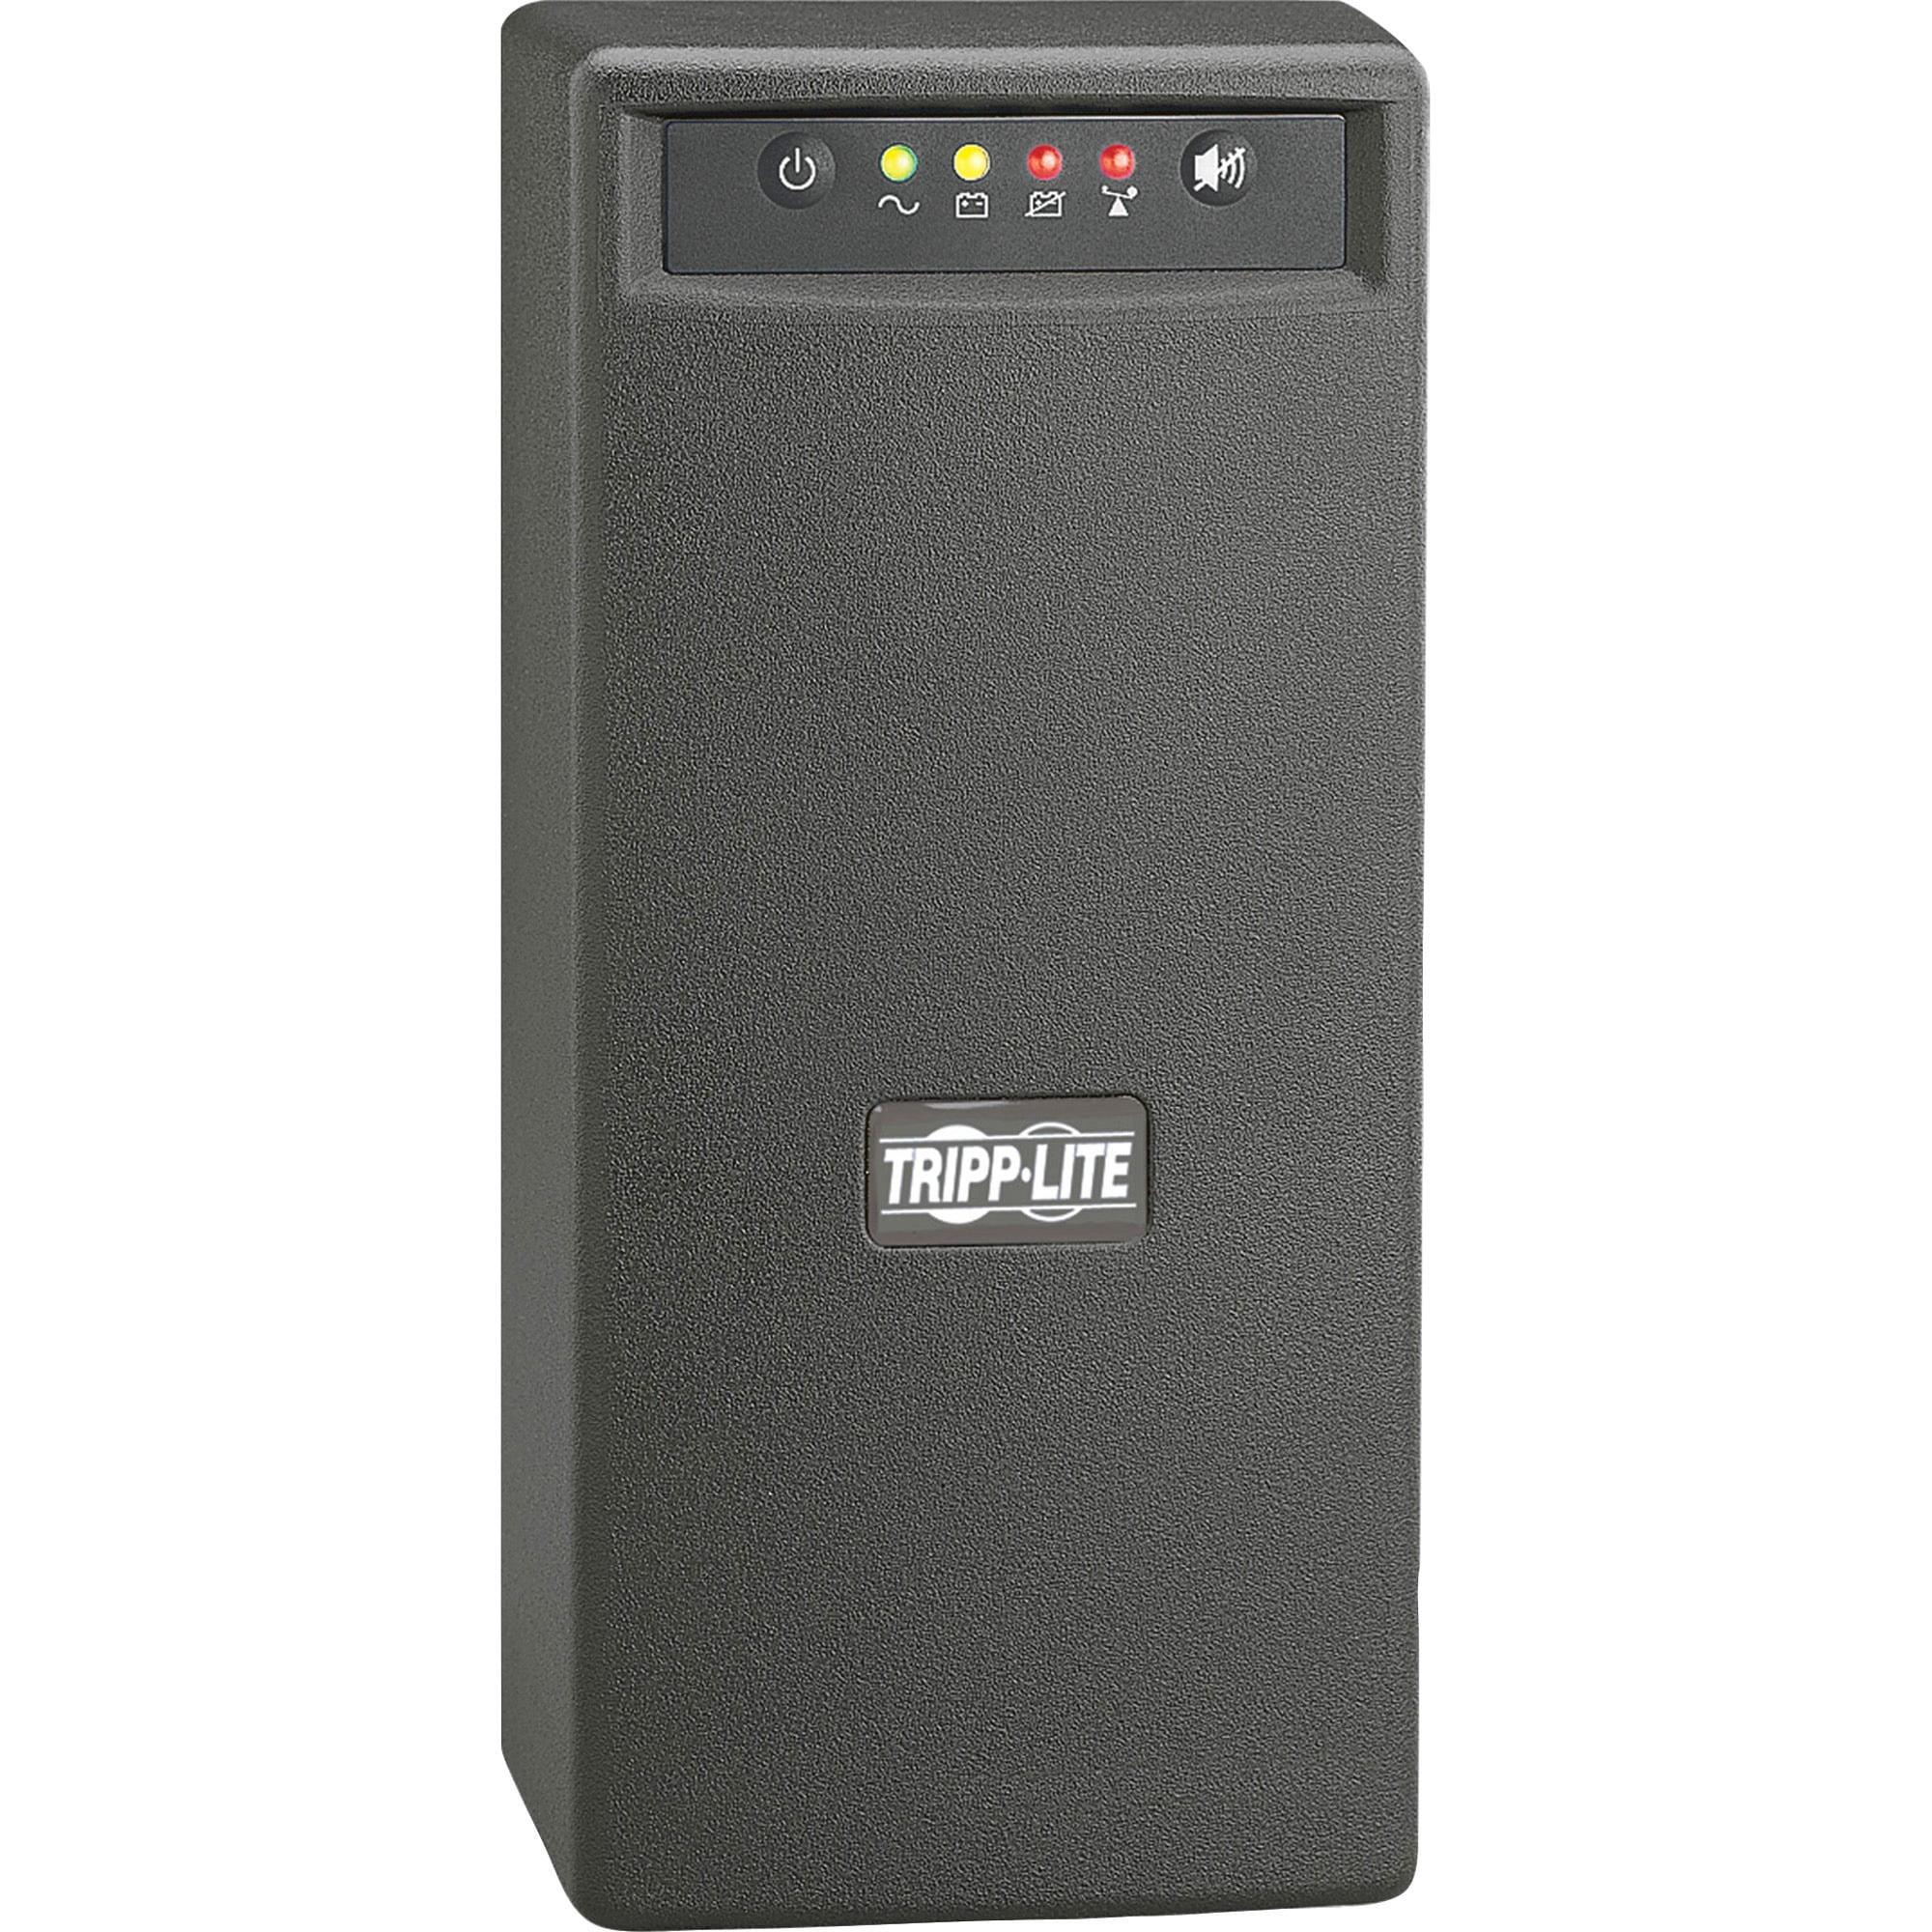 Tripp Lite UPS 1000VA 500W Battery Back Up Tower AVR 120V USB RJ45 by Tripp Lite